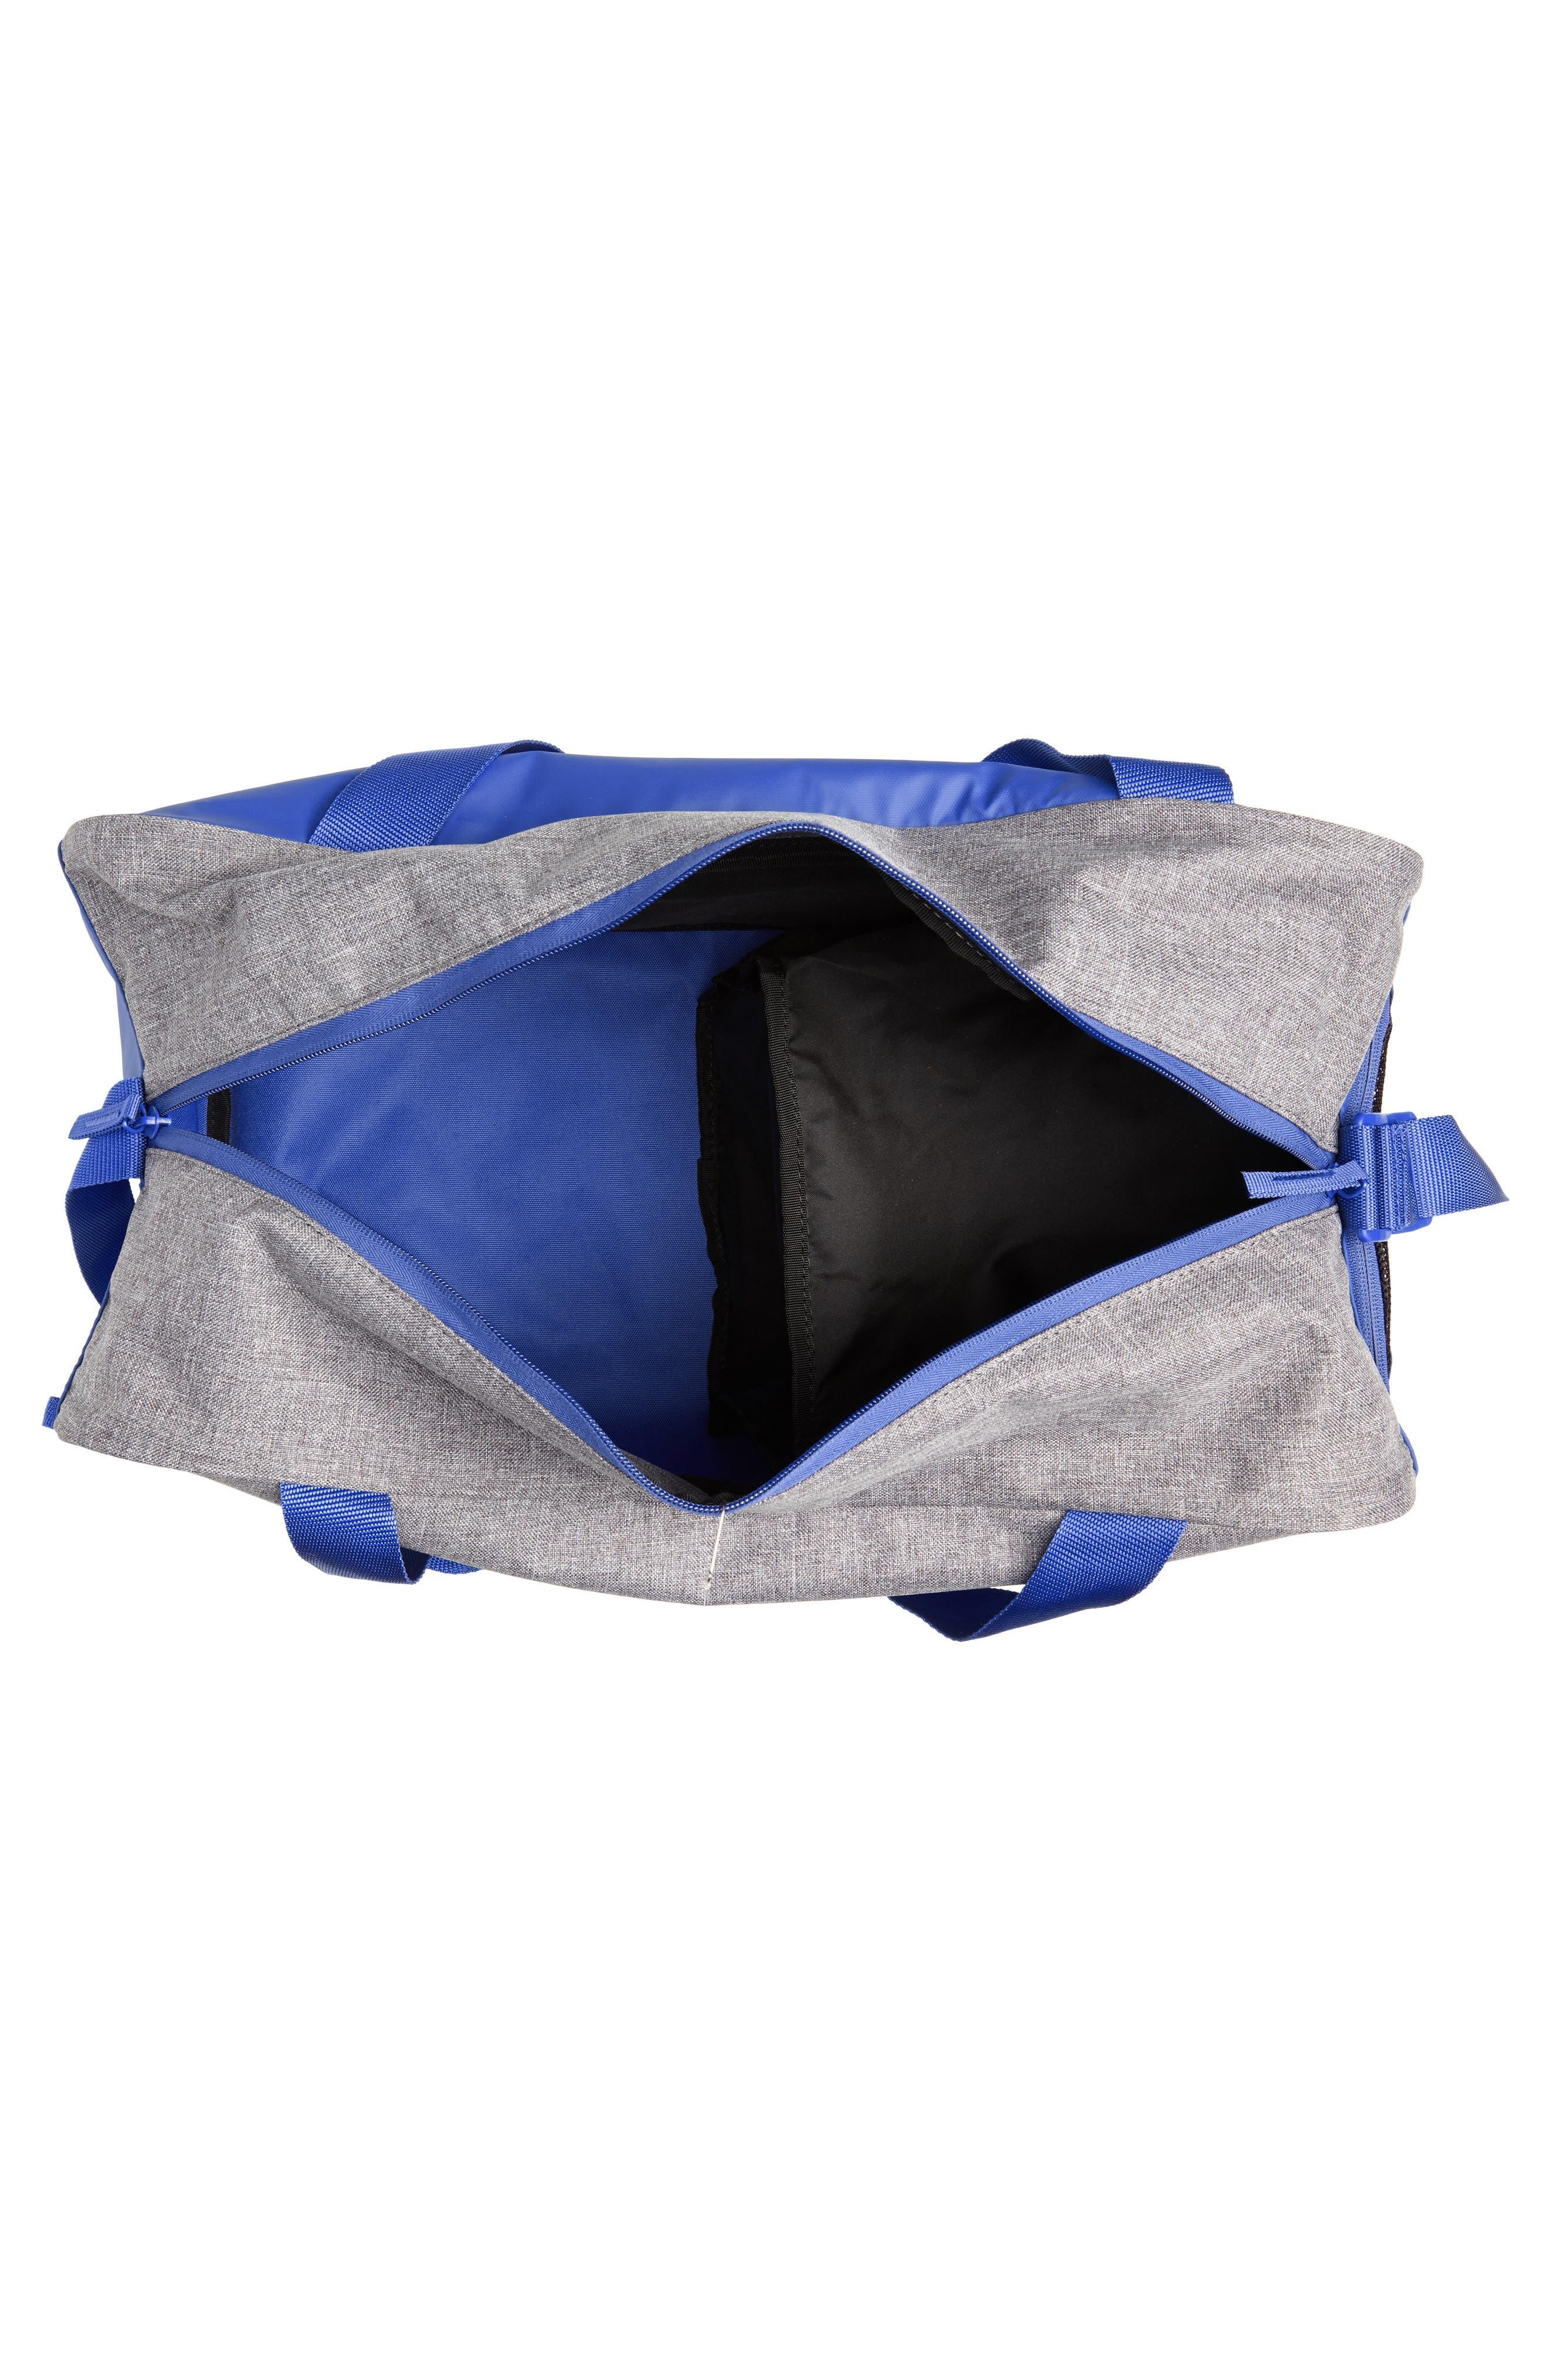 Jordan Pivot Duffle Bag,                             Alternate thumbnail 3, color,                             431